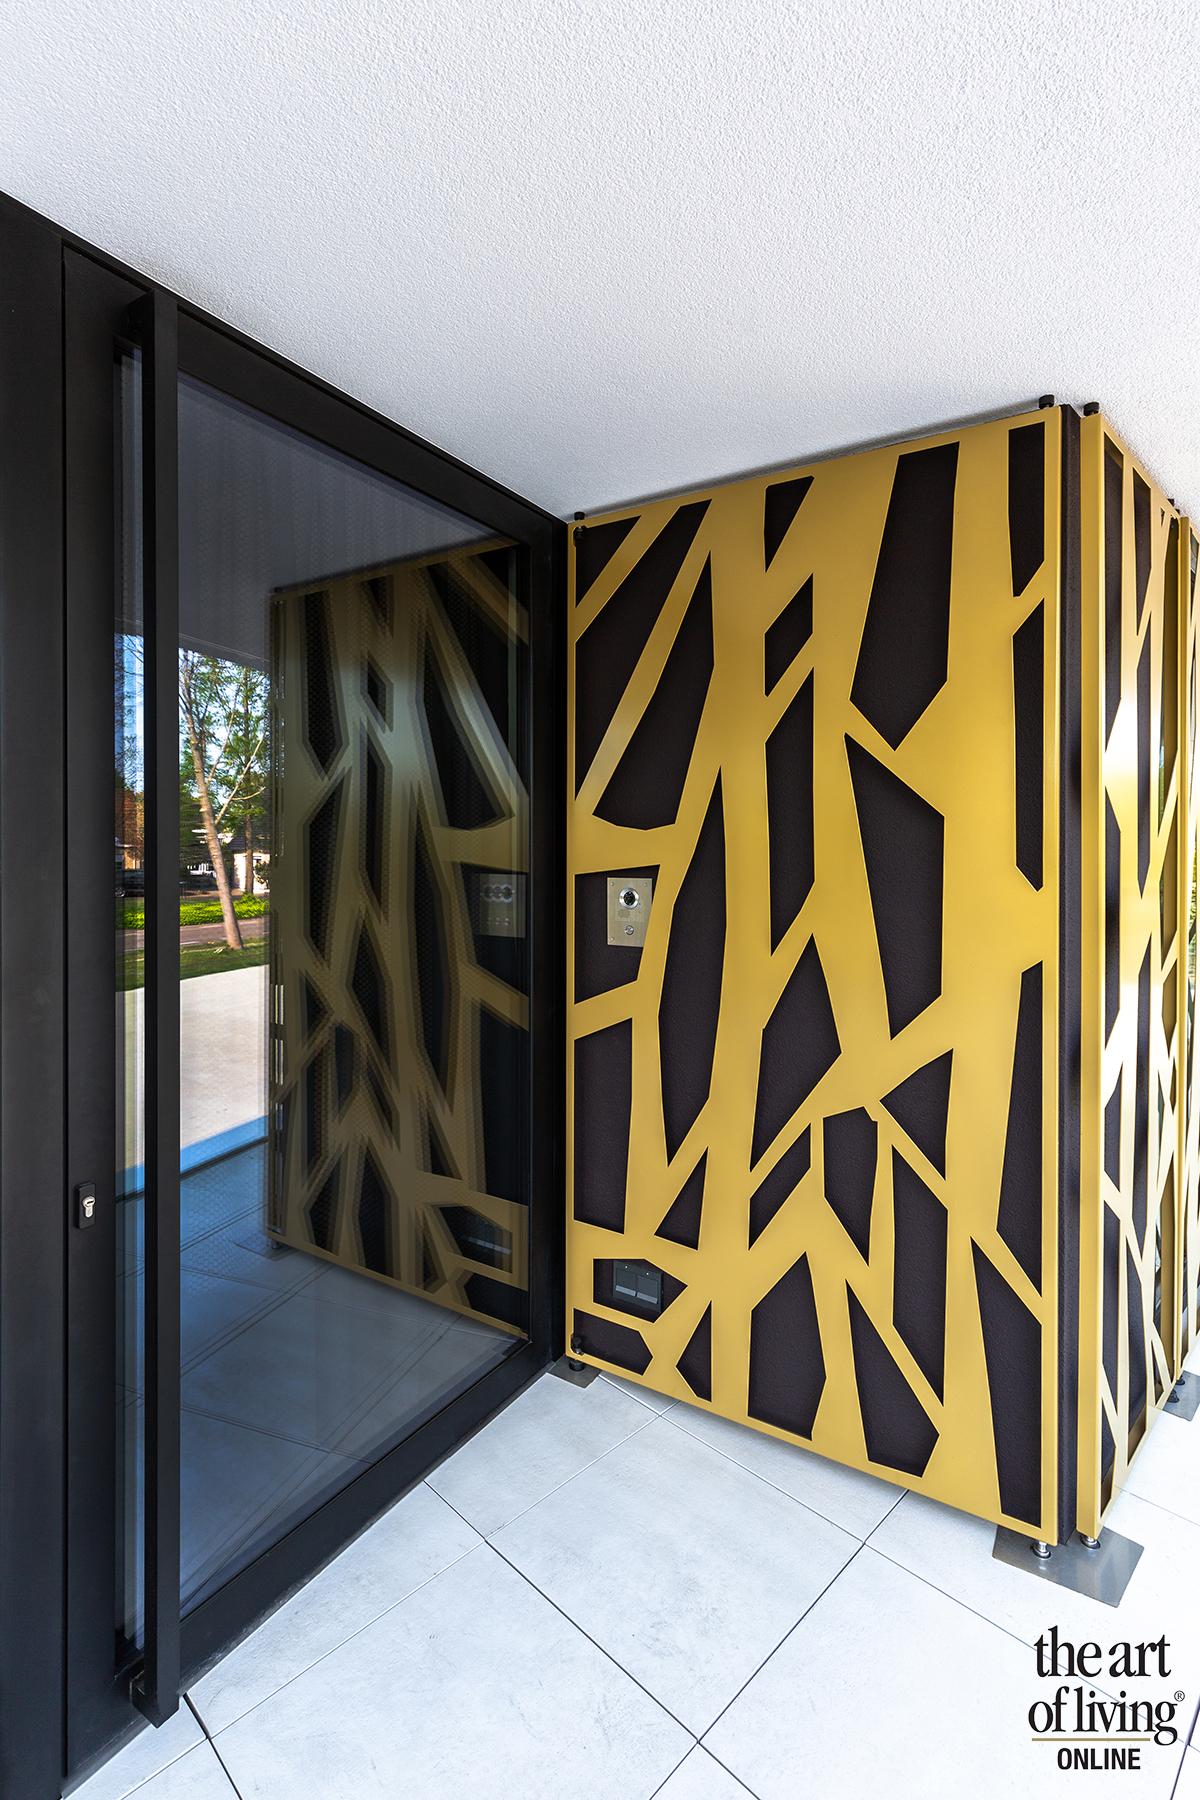 Duurzame villa, Lab 32 architecten, the art of living